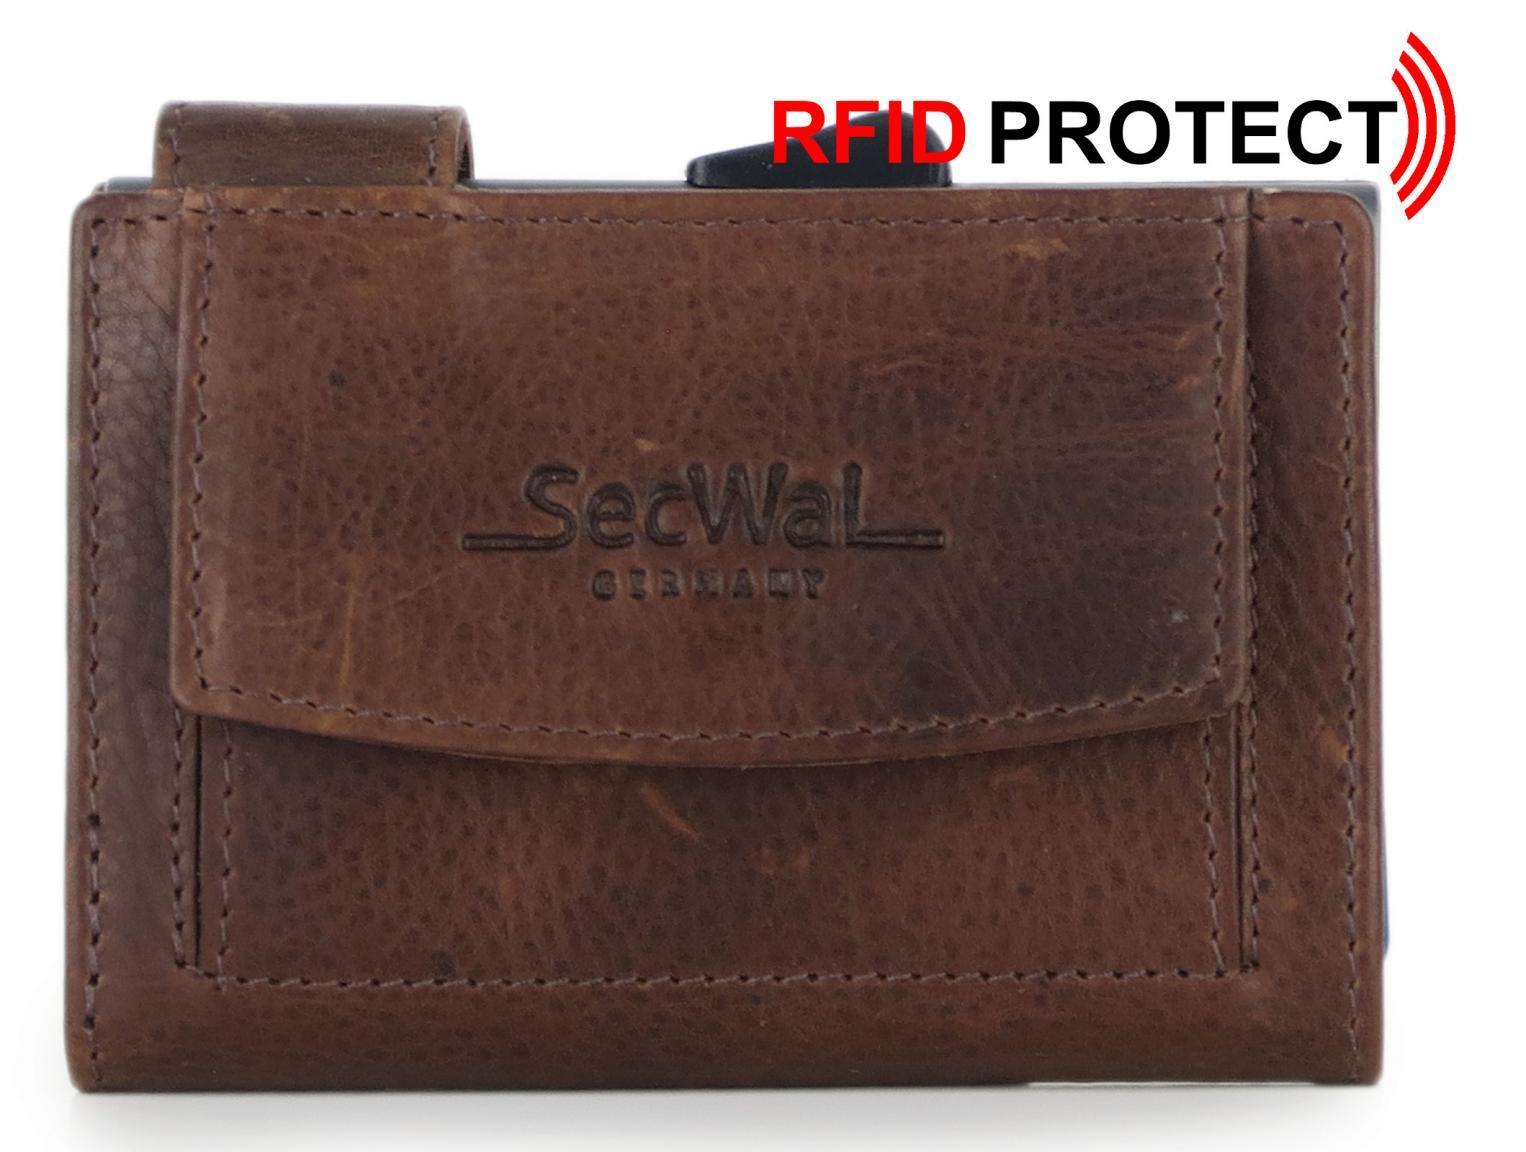 SecWal Bull Kreditkartenbörse RFID Schutz braun Leder